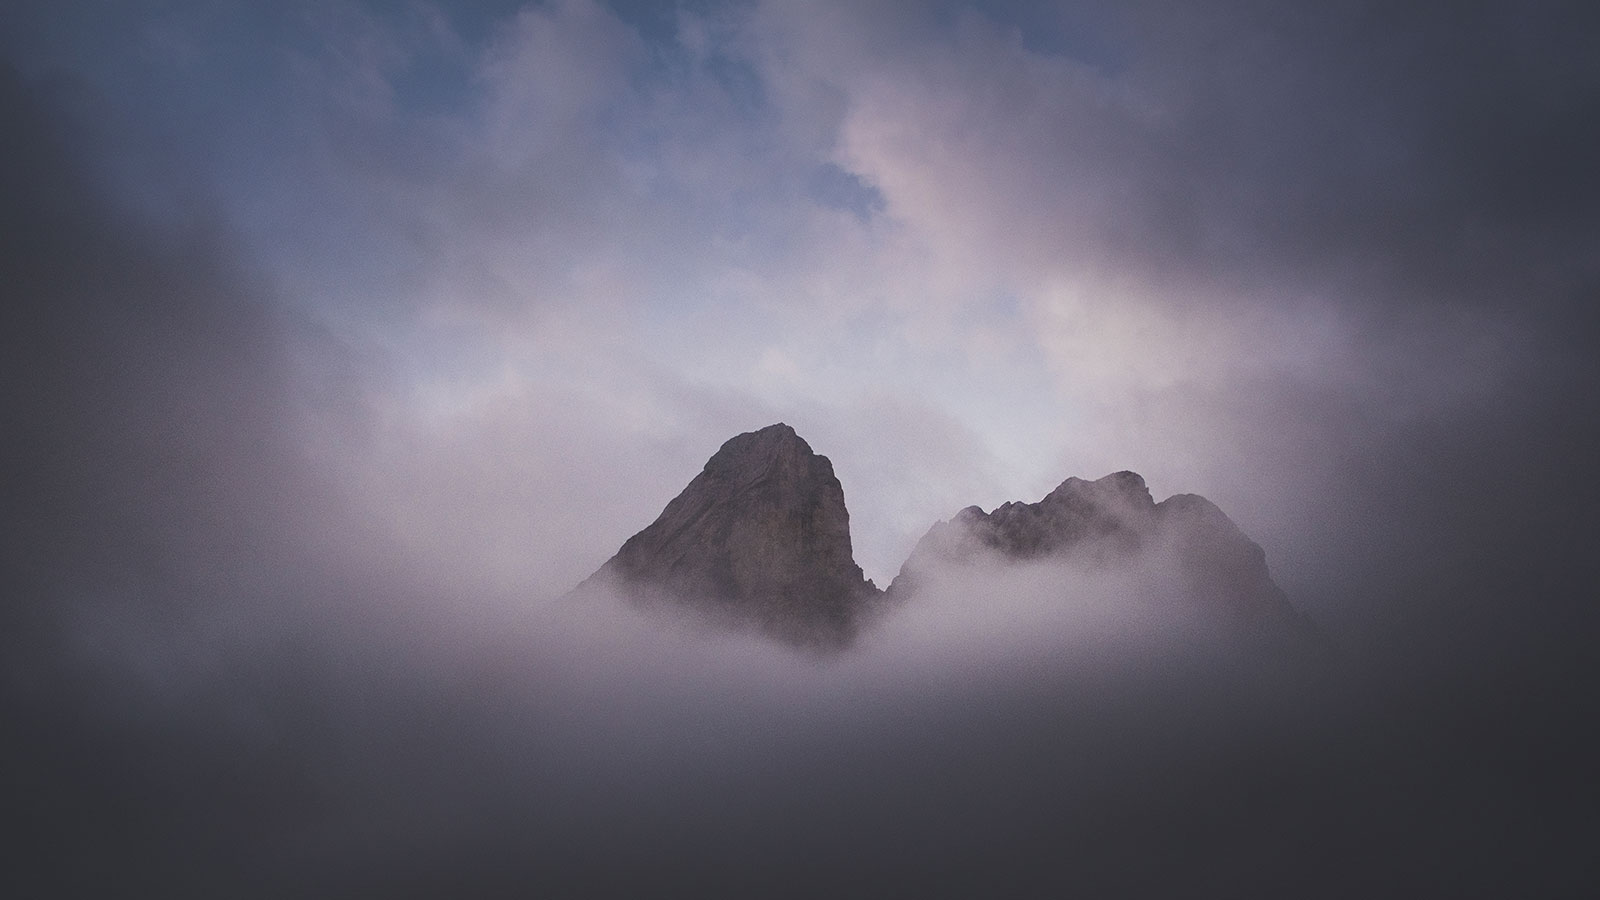 Durchblick. Nebel am Peitlerkofl, Dolomiten | Pauli Trenkwalder, Berge & Psychologie